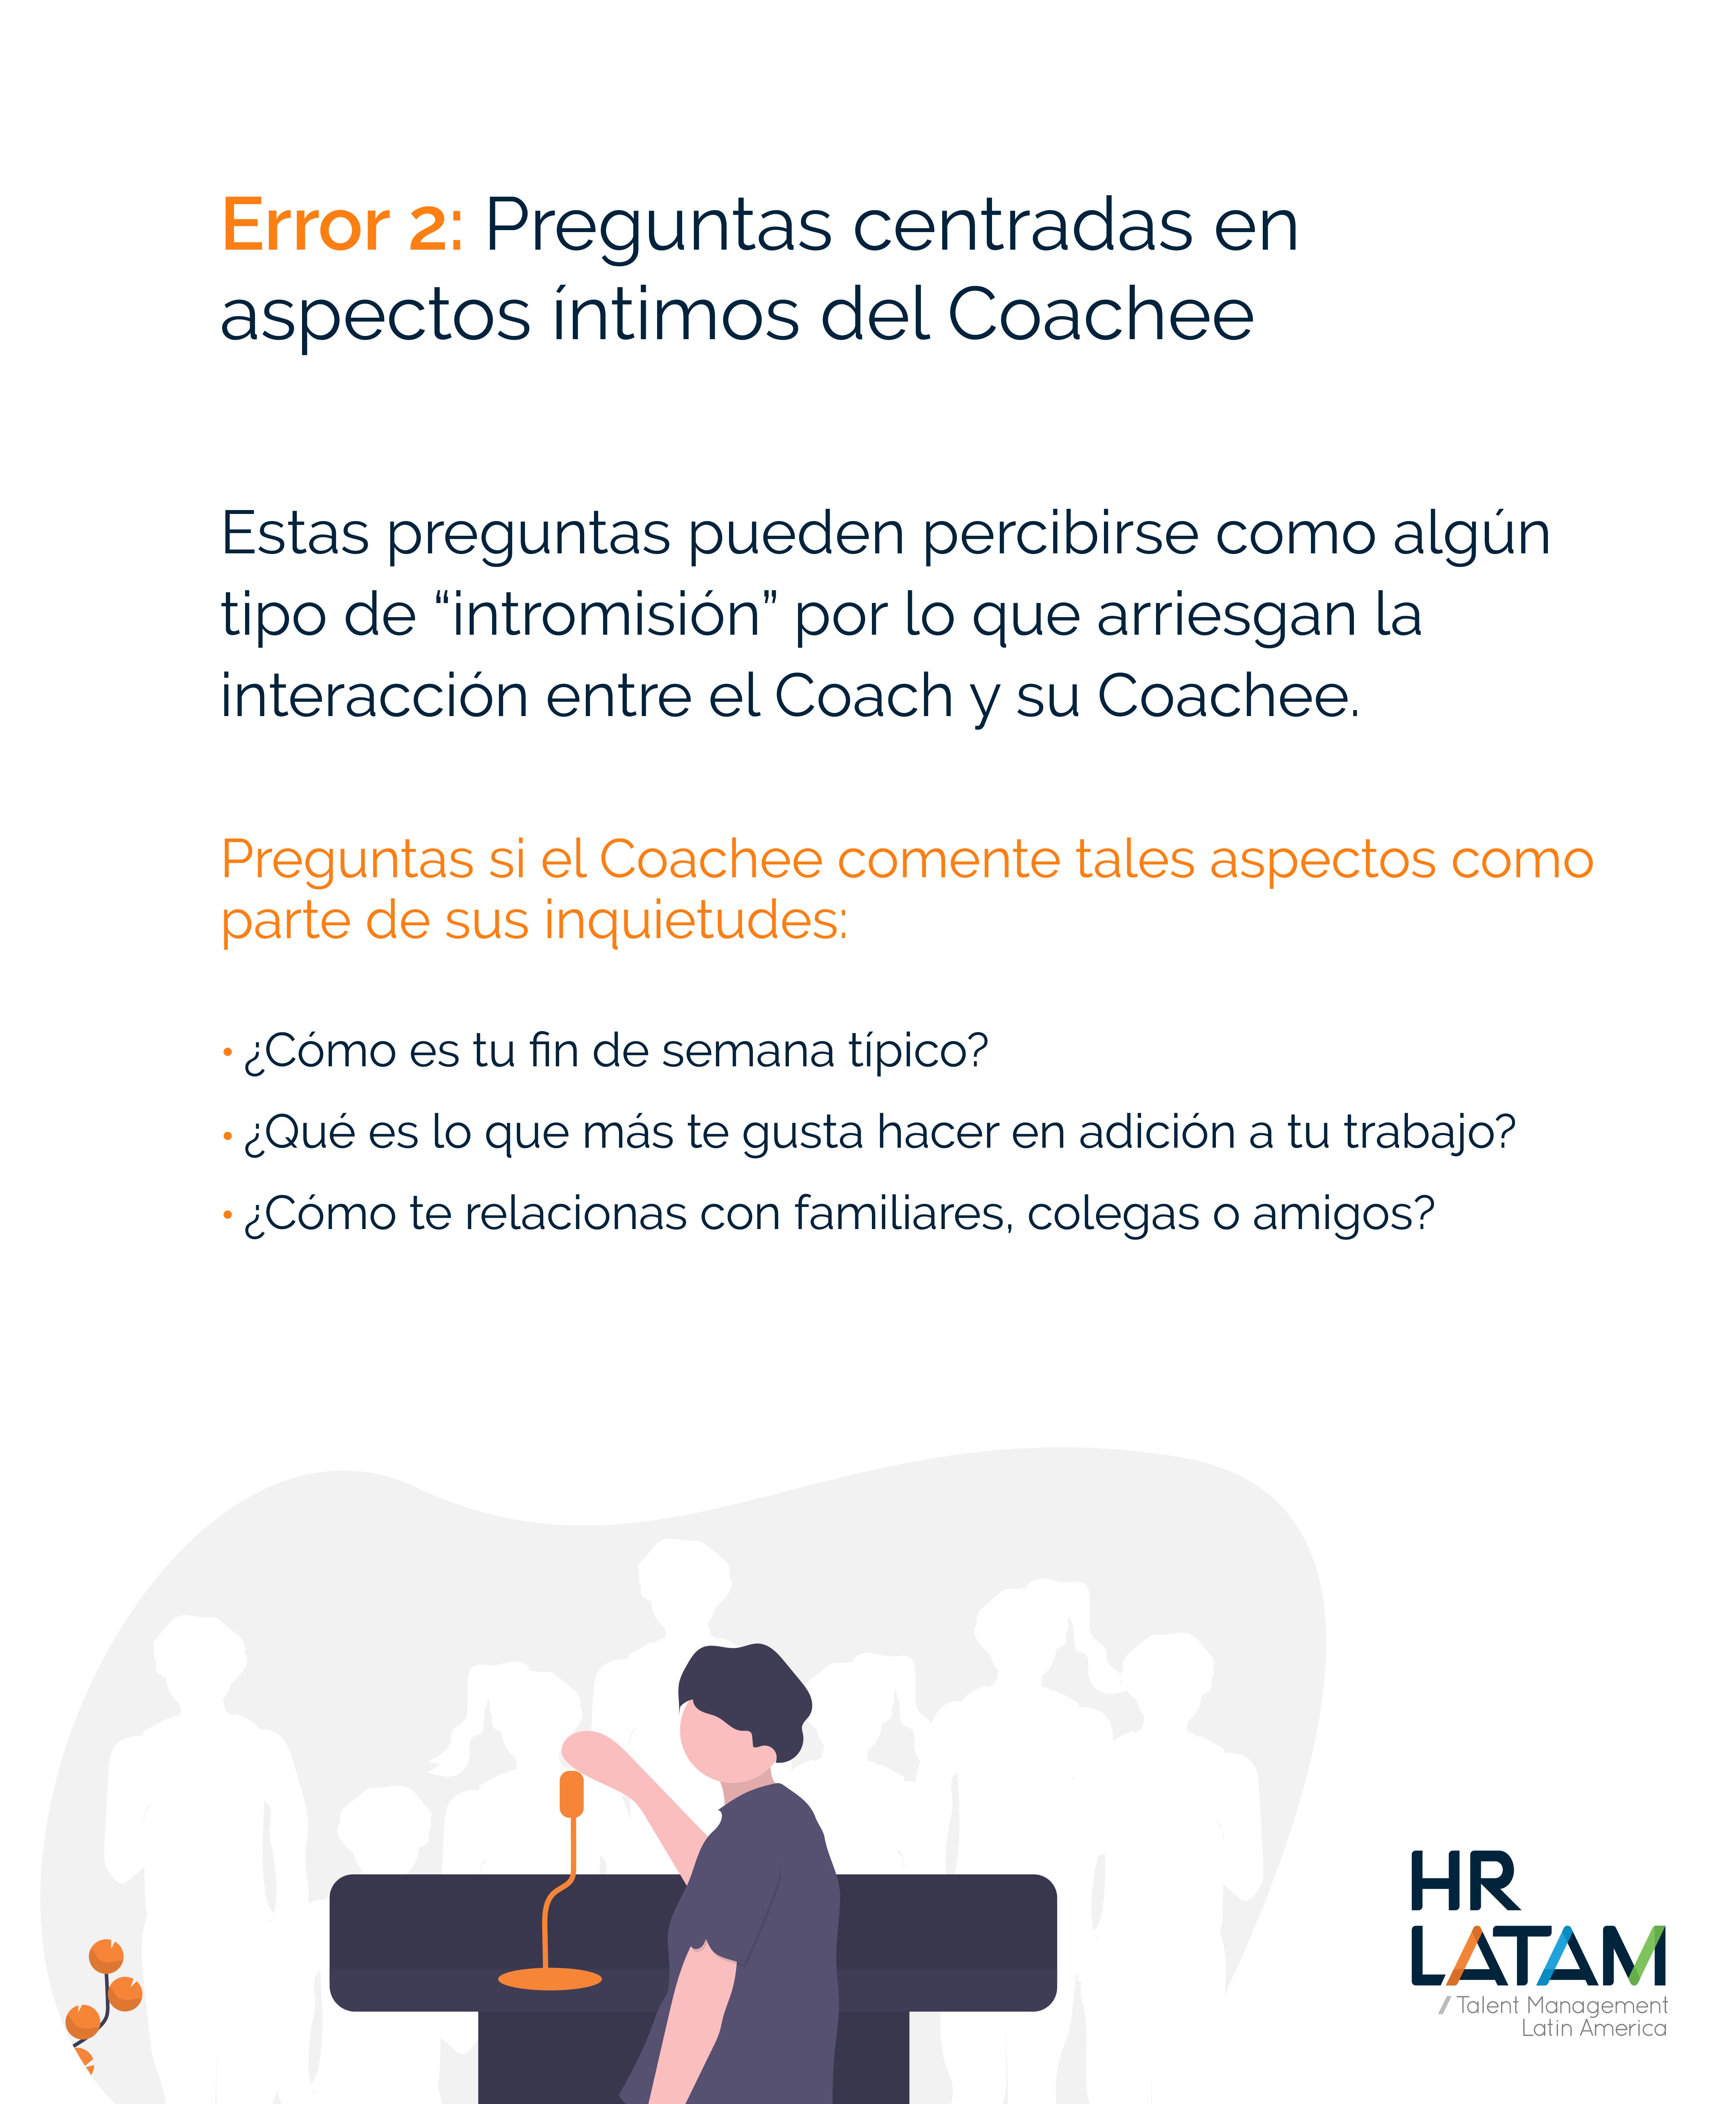 Error 2: Preguntas centradas en aspectos íntimos del Coachee (coaching)